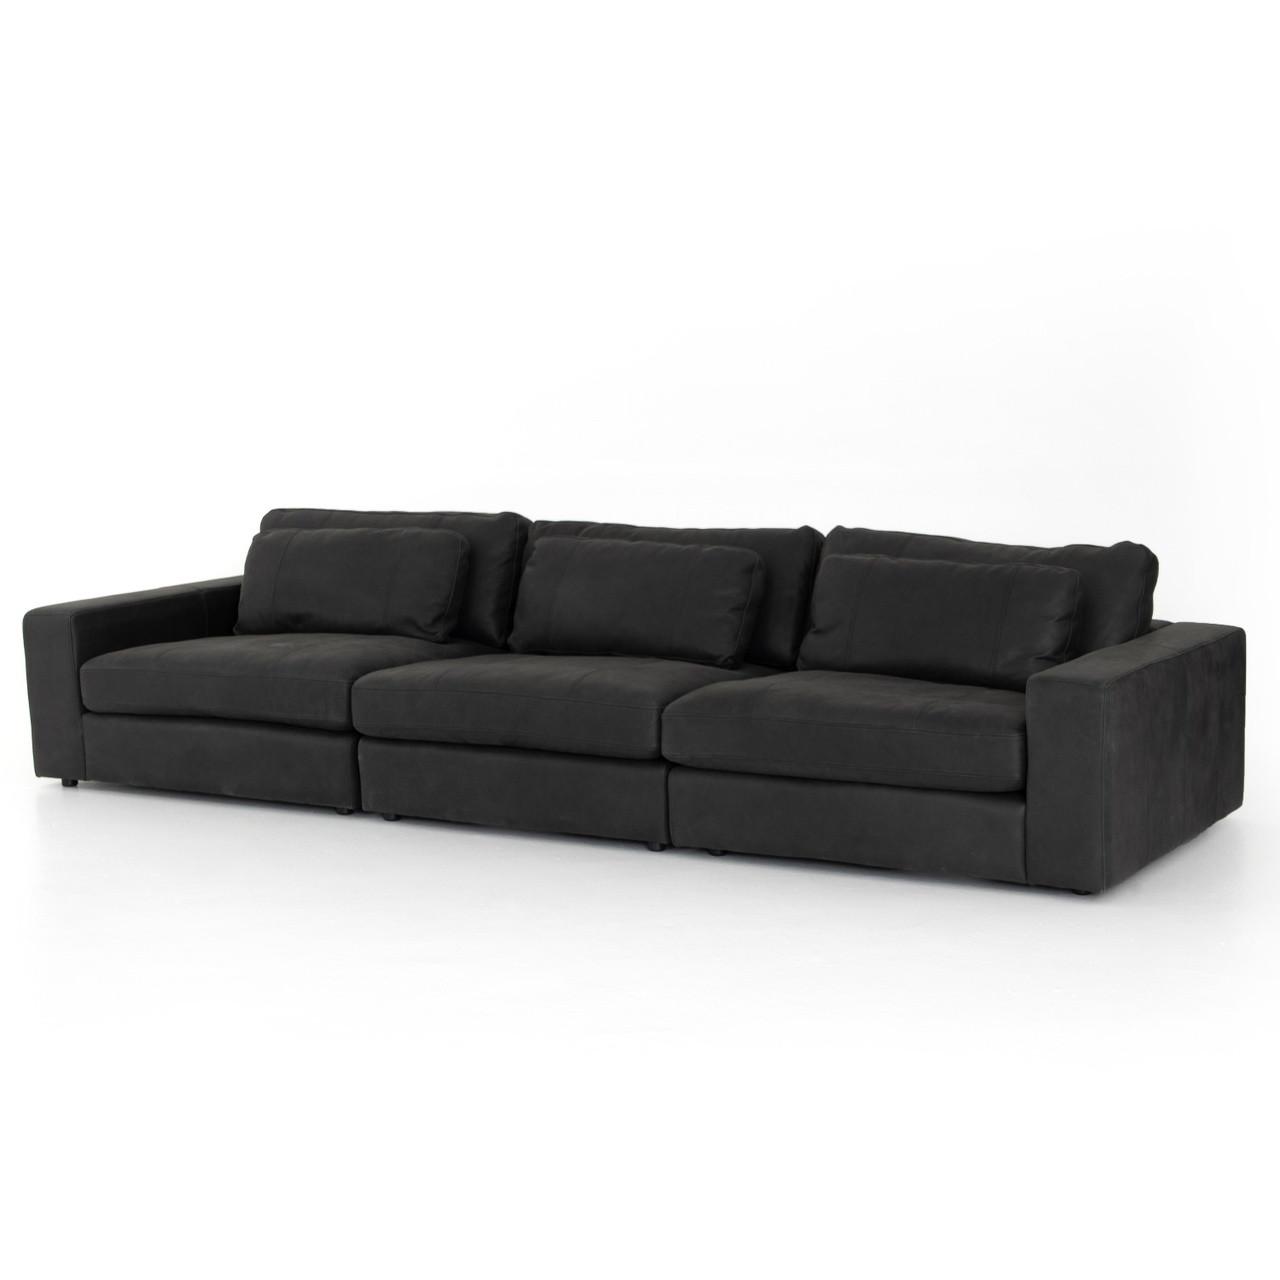 Bloor Black Leather 3-Piece Modular Sofa 135\